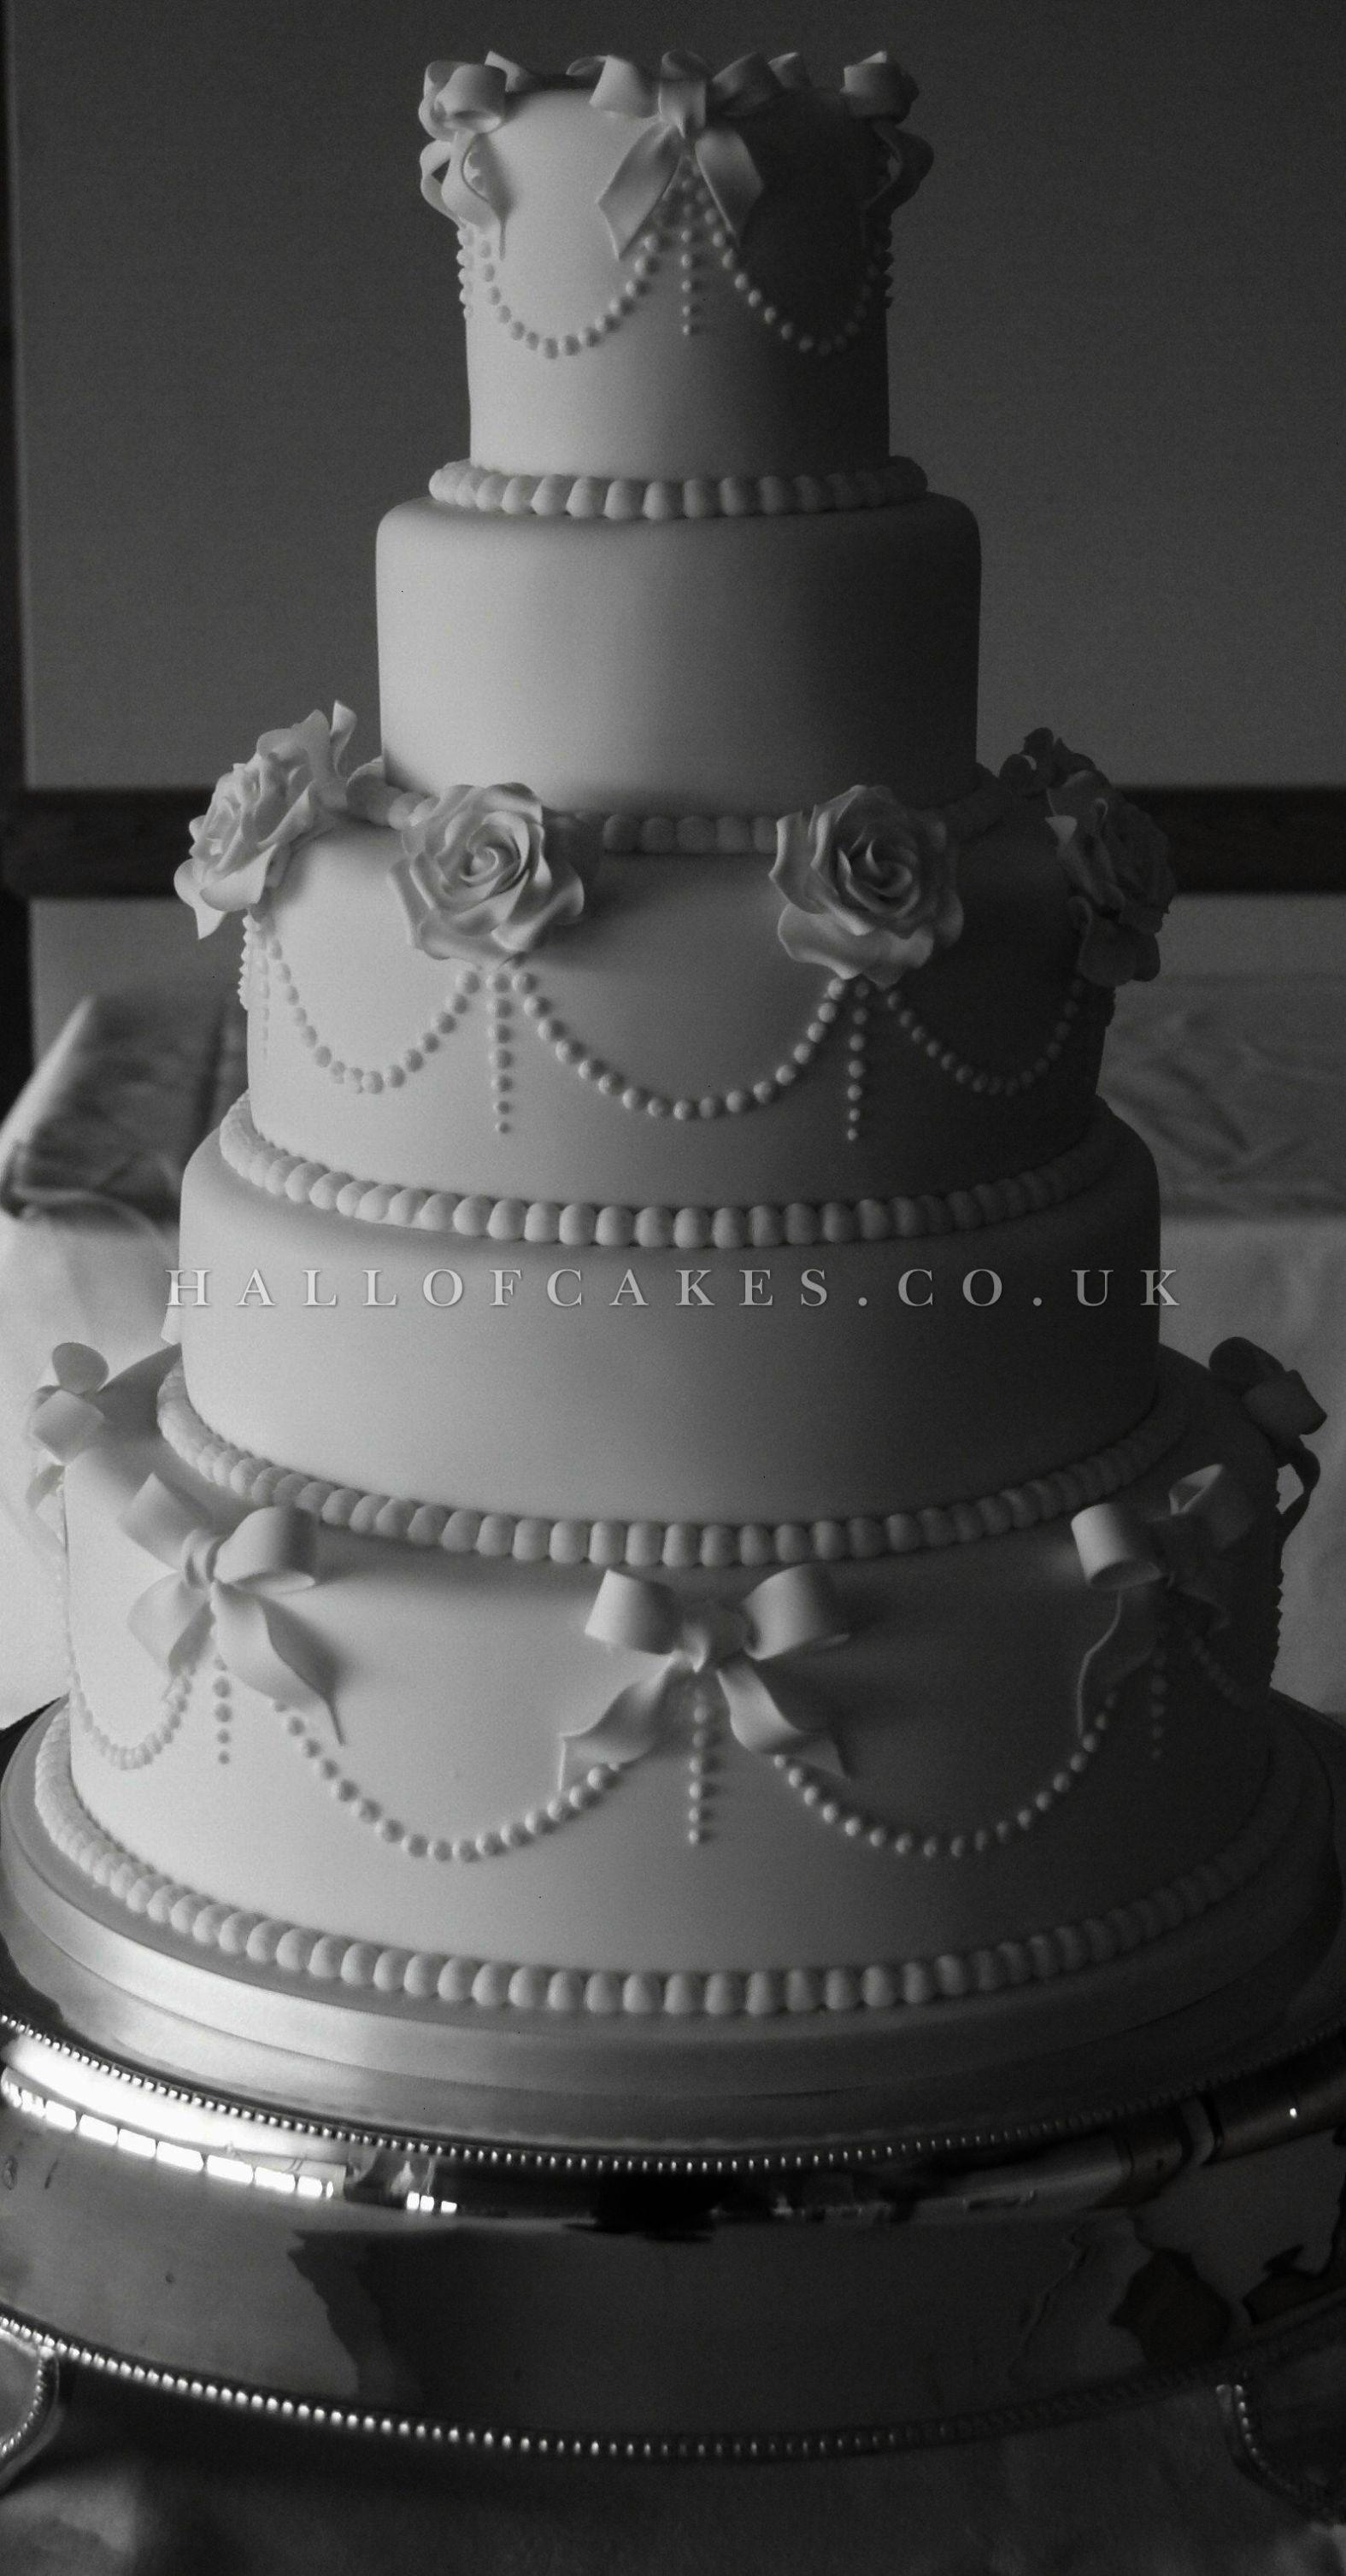 Zambian wedding decorations  Impressive ue Unique Wedding Cakes Zambia D  Wedding Cakes